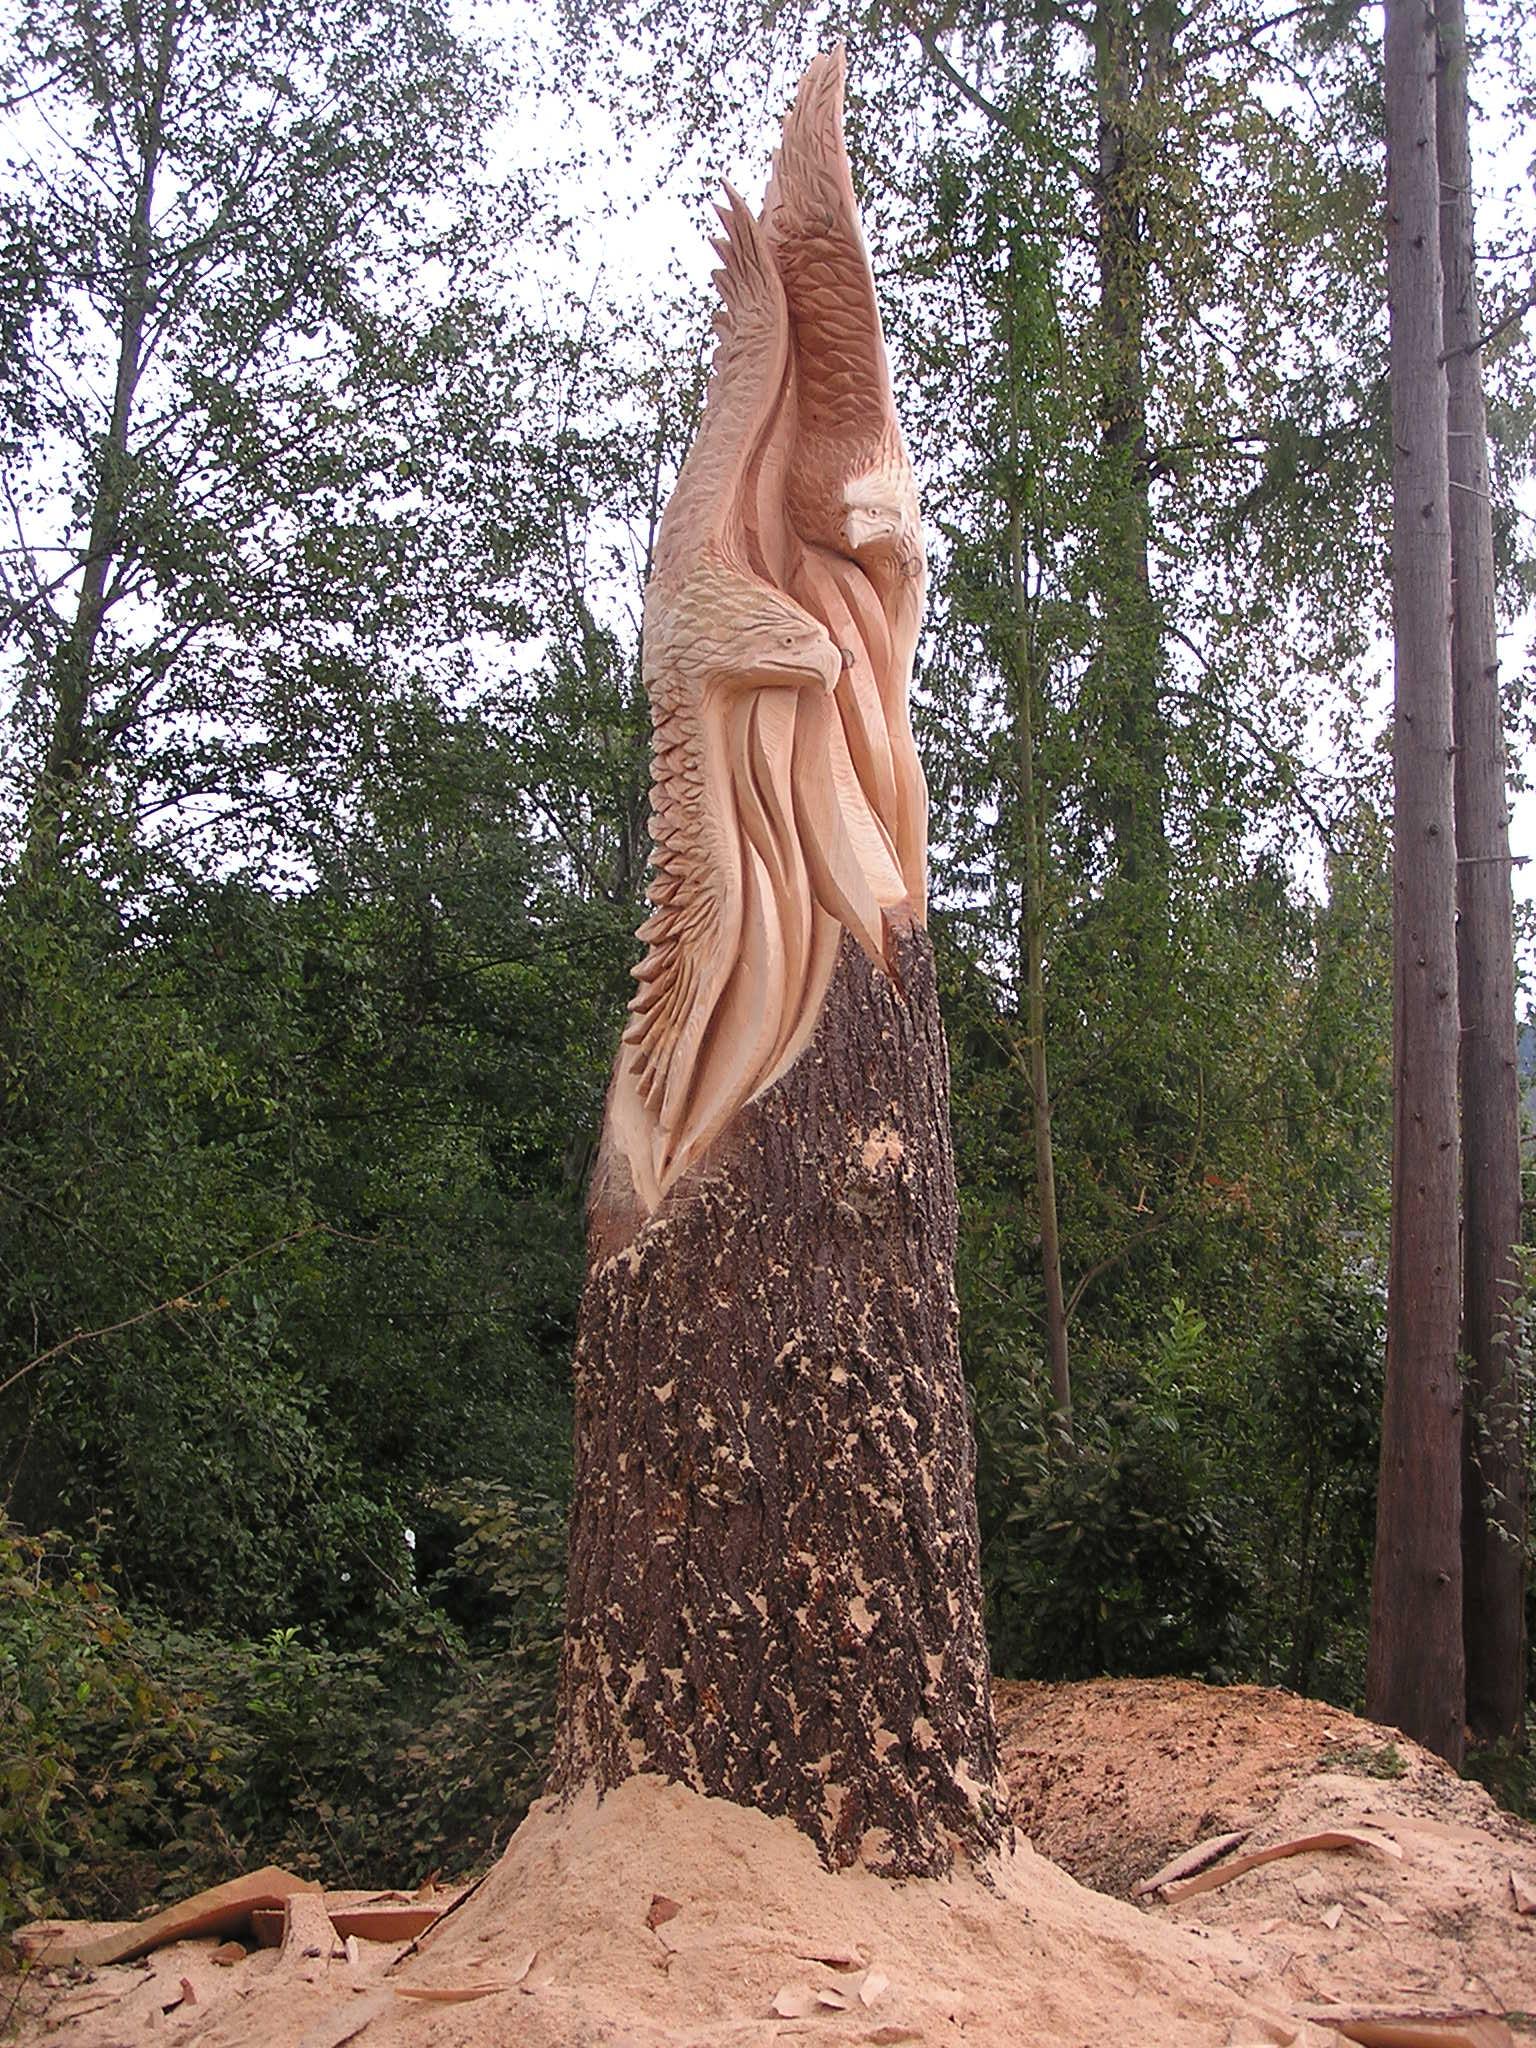 24 Impressive Stump Carved Sculptures Pop Culture